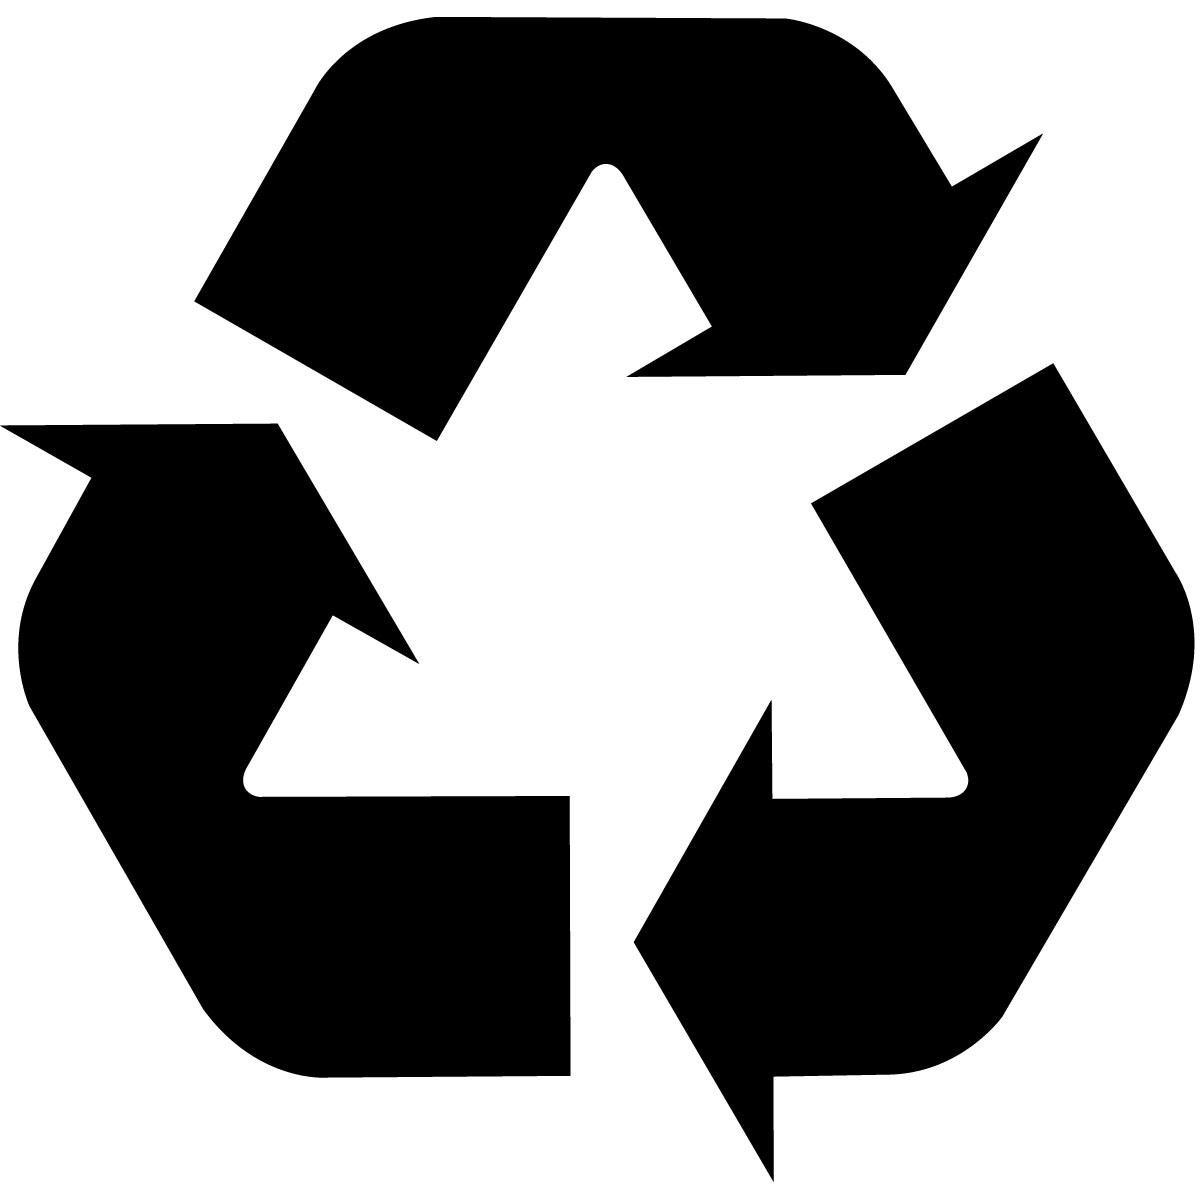 recycling logo black arrows recycling logo white arrows recycling logo ...